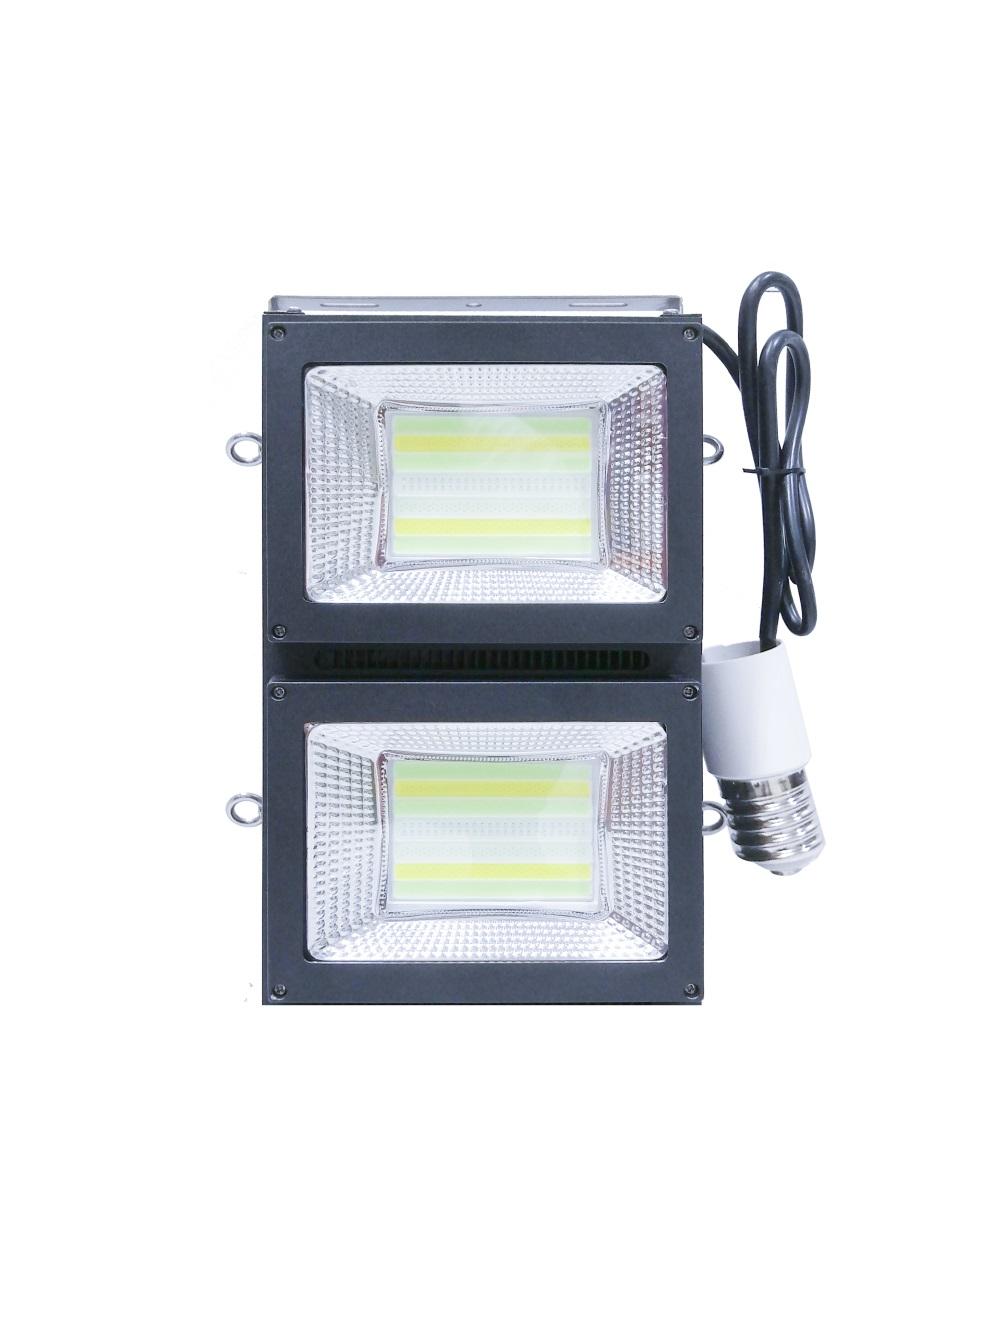 LED fishing light IP65 high quality 500W 750W efficient fishing marine use